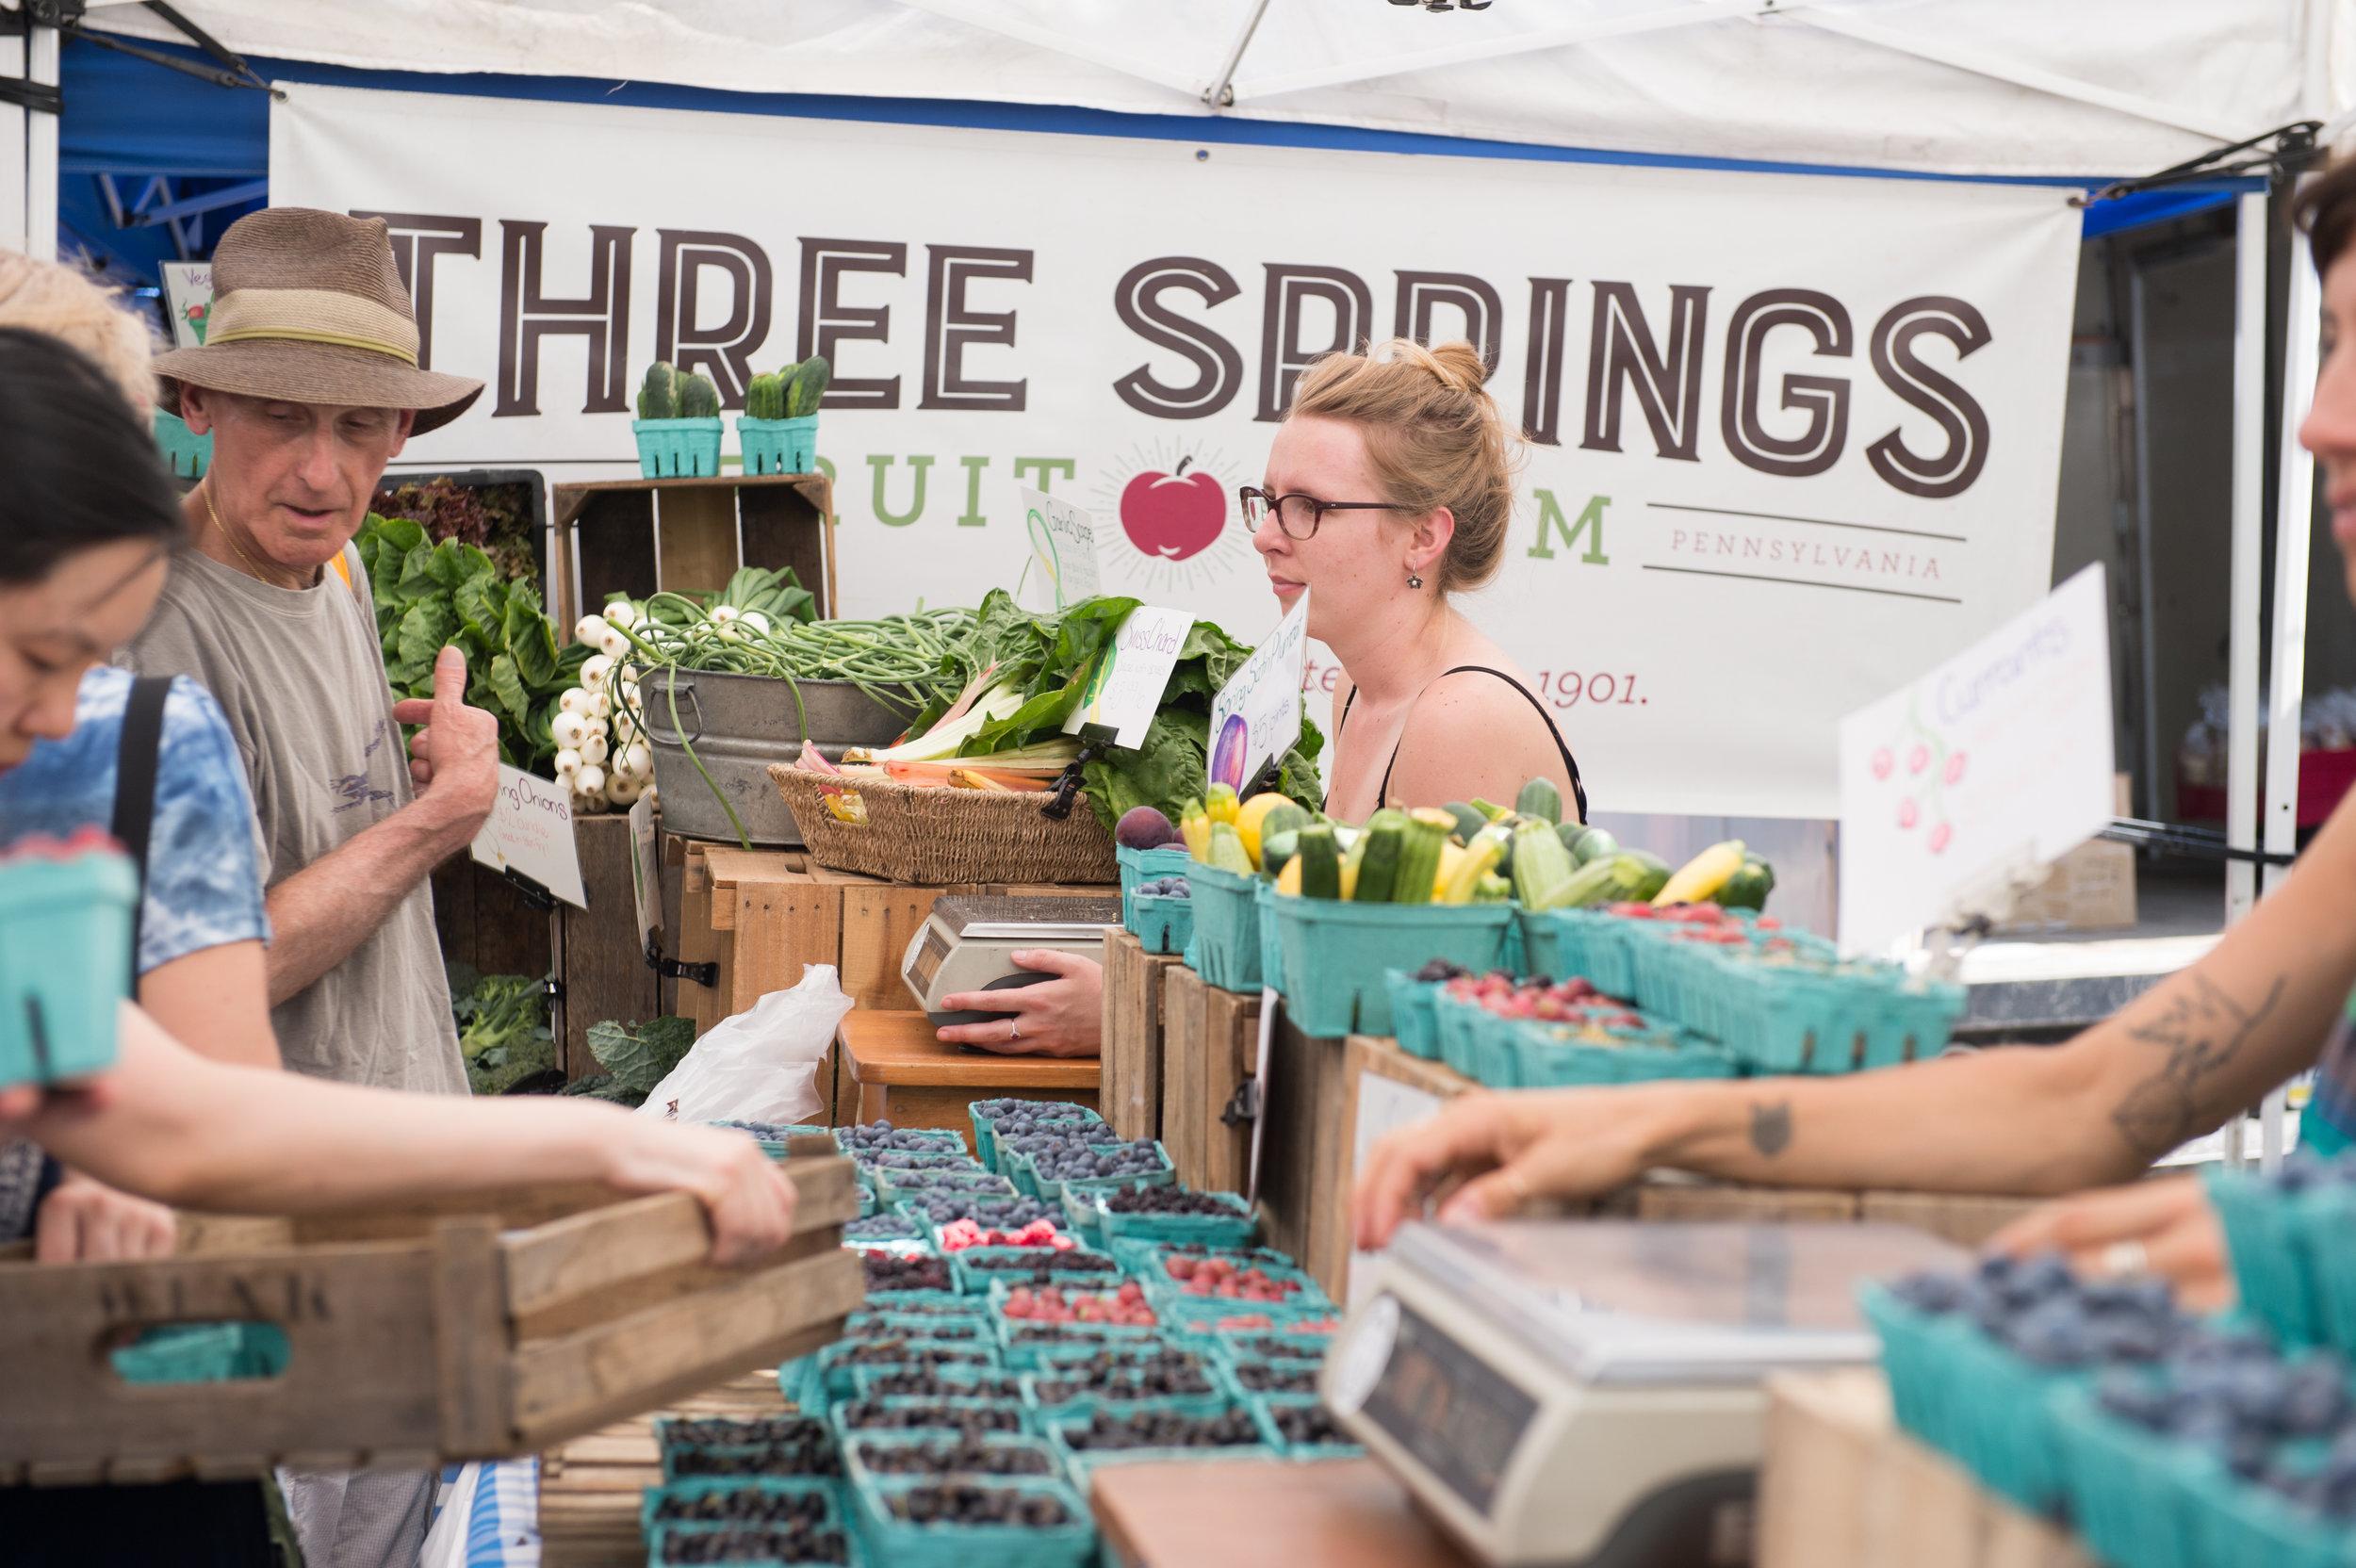 Three Springs Fruit Farm at Headhouse Market